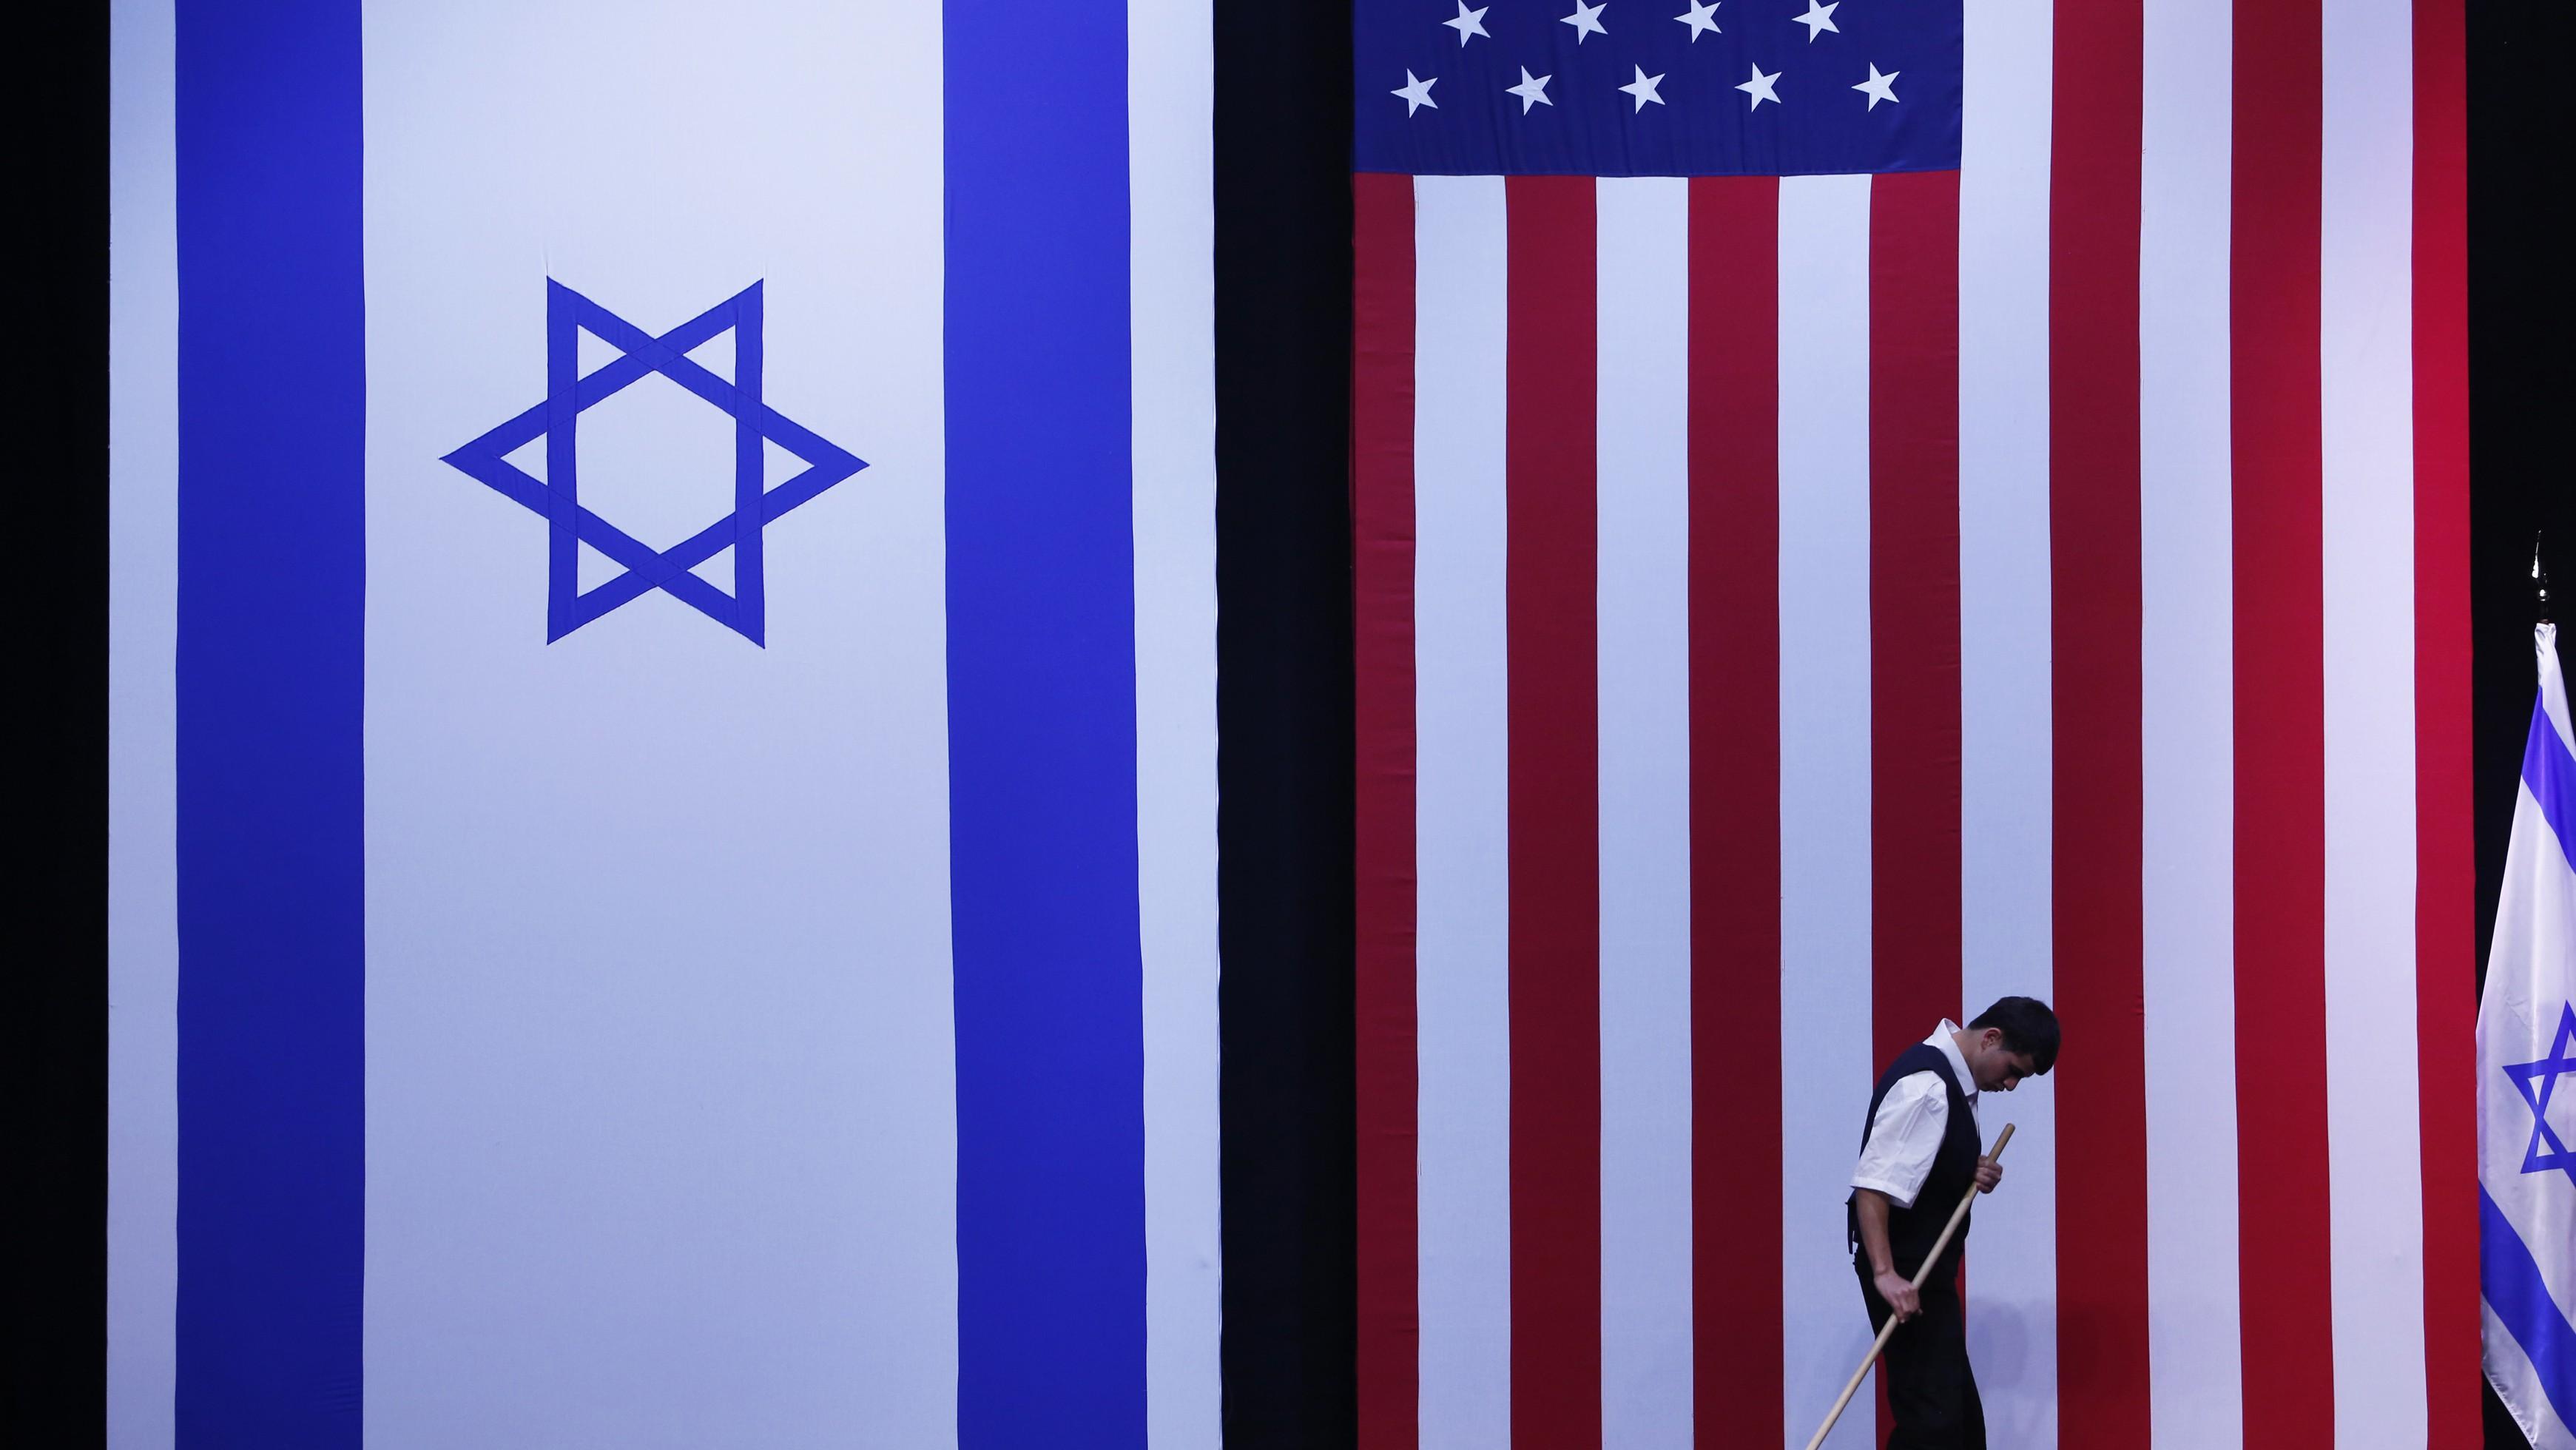 Israel Jewish community theater censorship